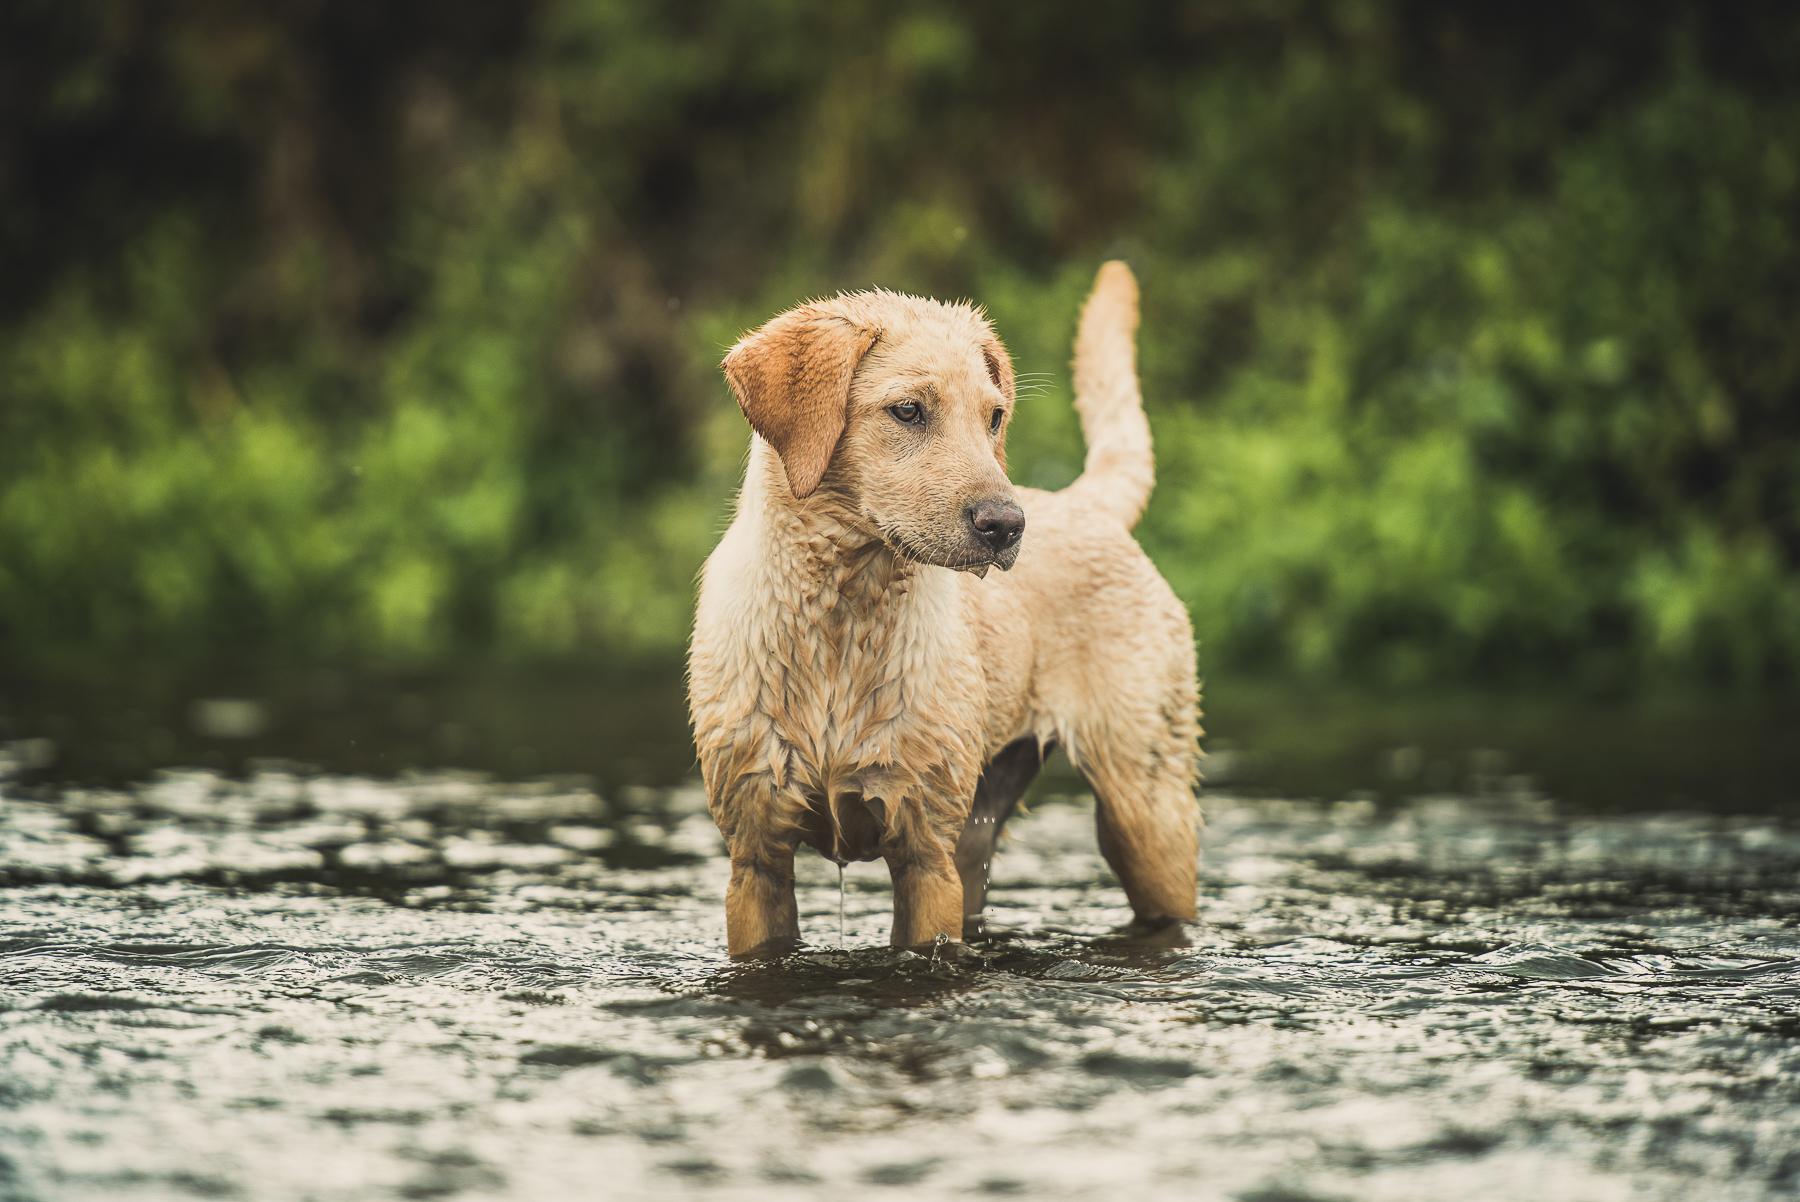 Golden labrador standing in a river